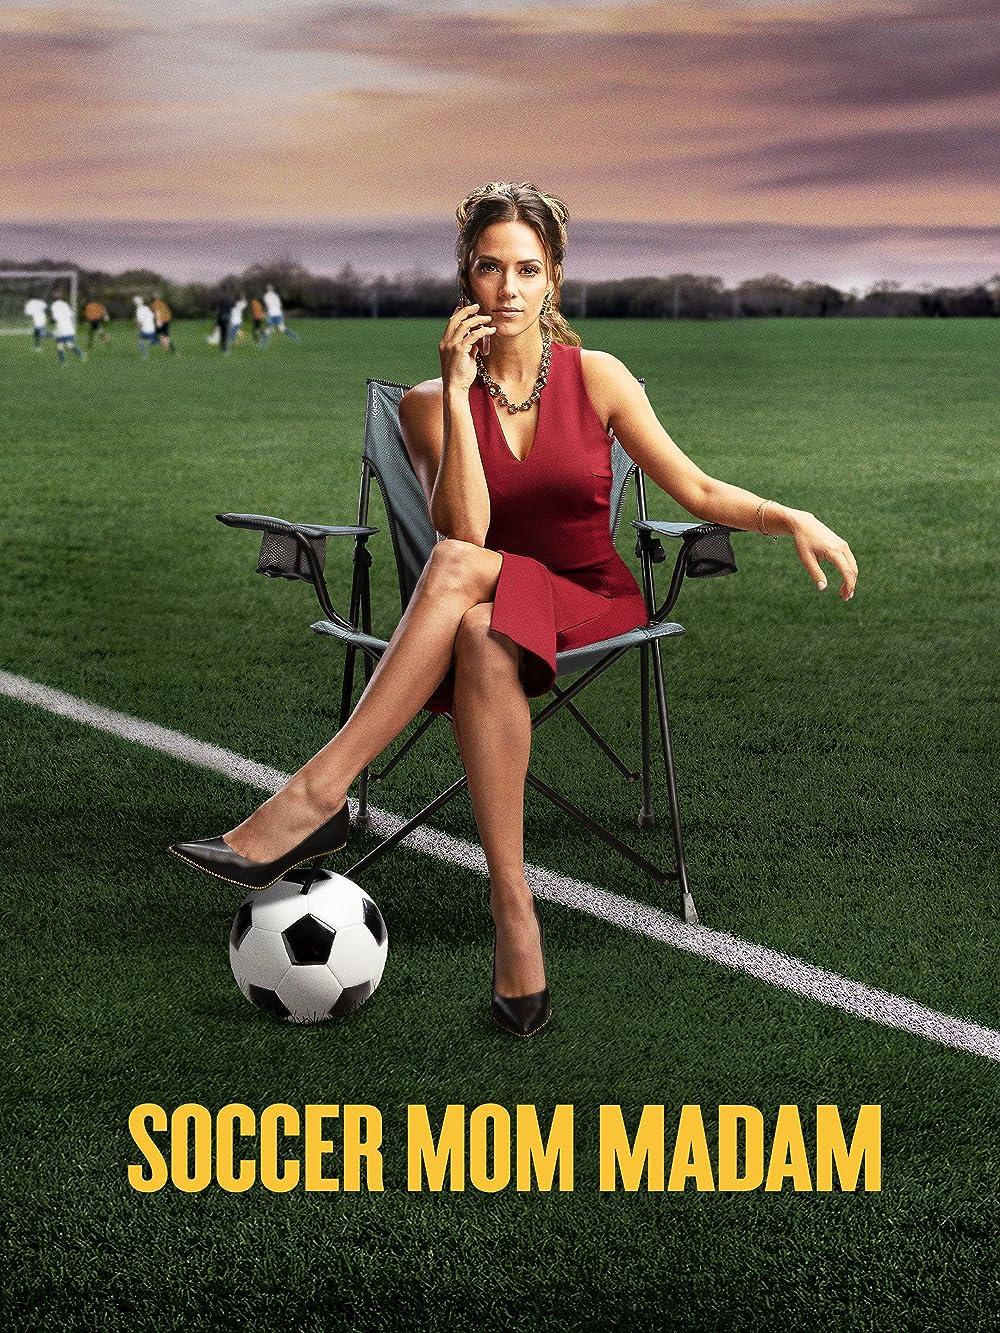 Soccer Mom Madam (TV Movie 2021) - IMDb